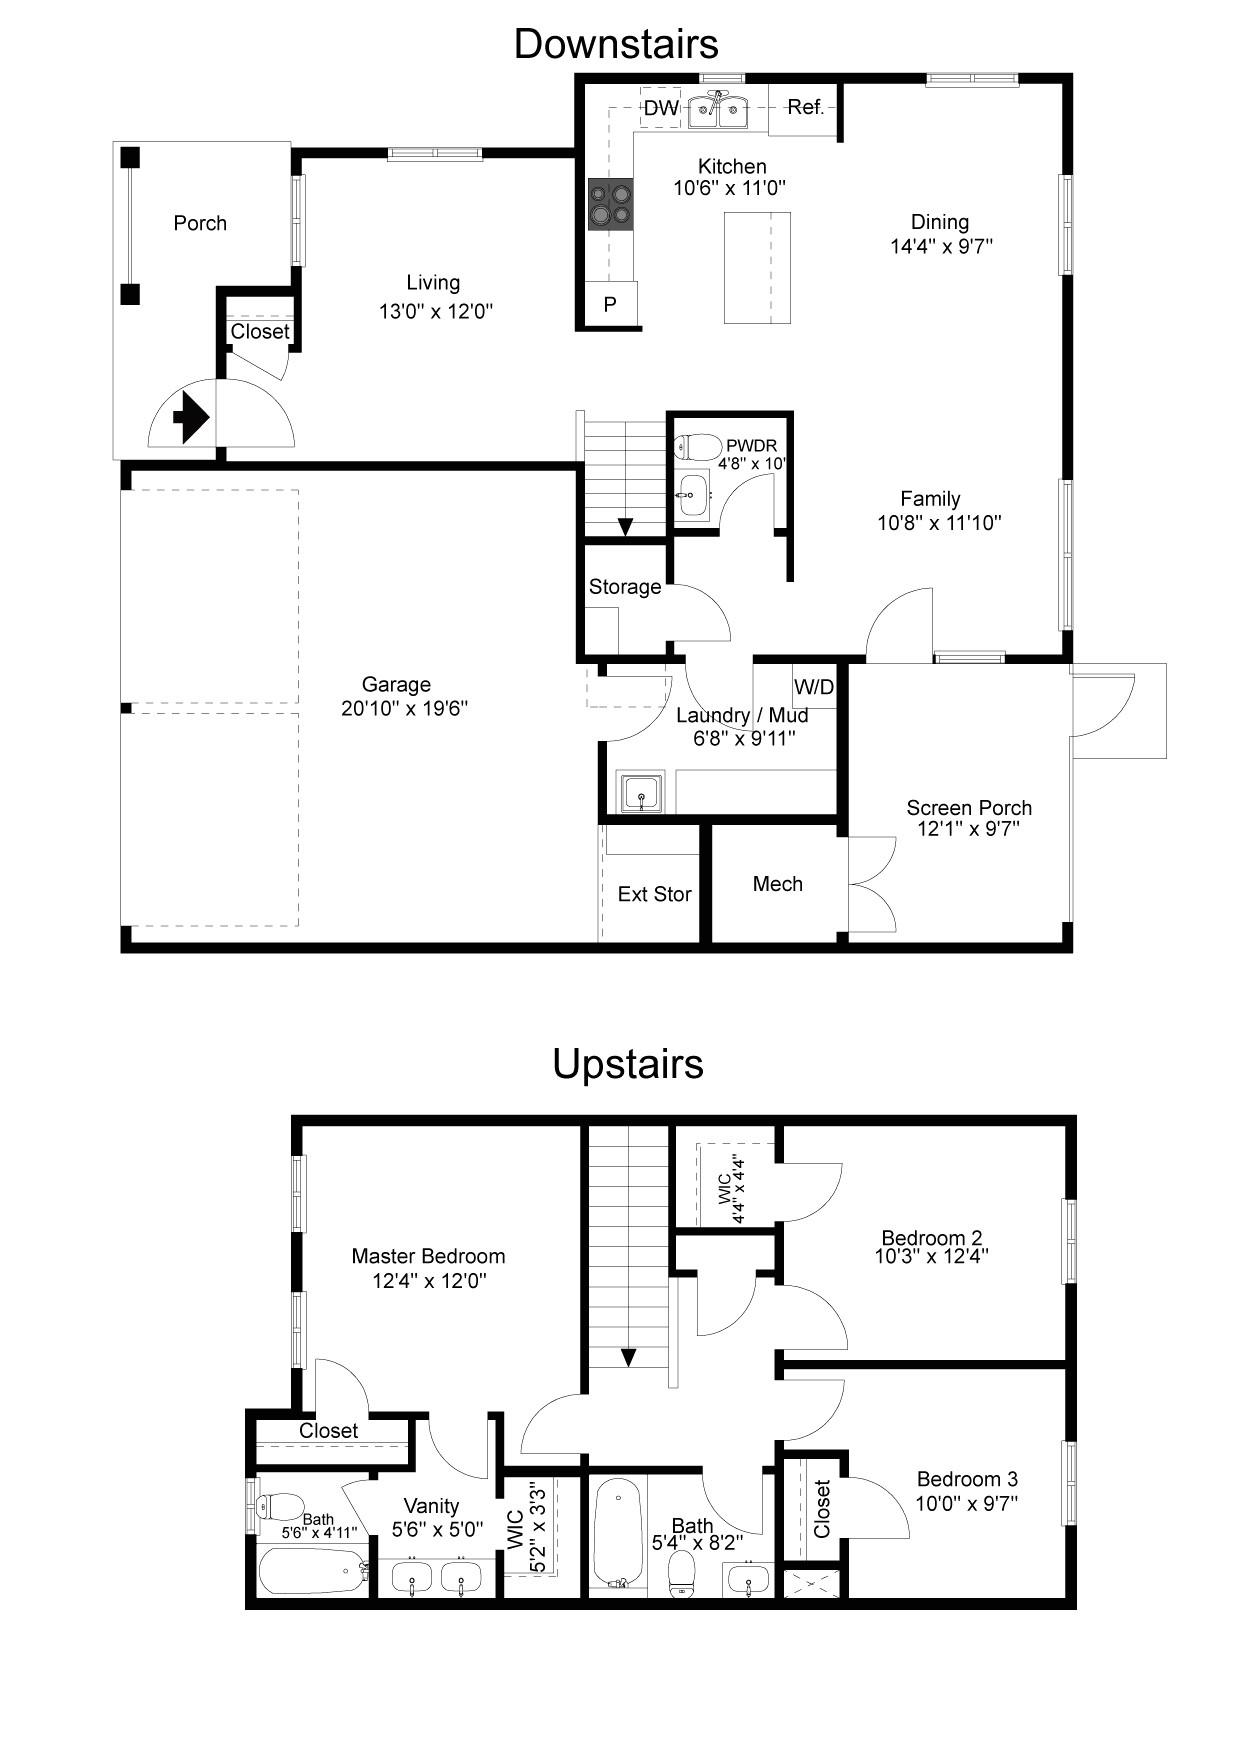 Kadena Afb Housing Floor Plans Kadena Afb Housing Floor Plans